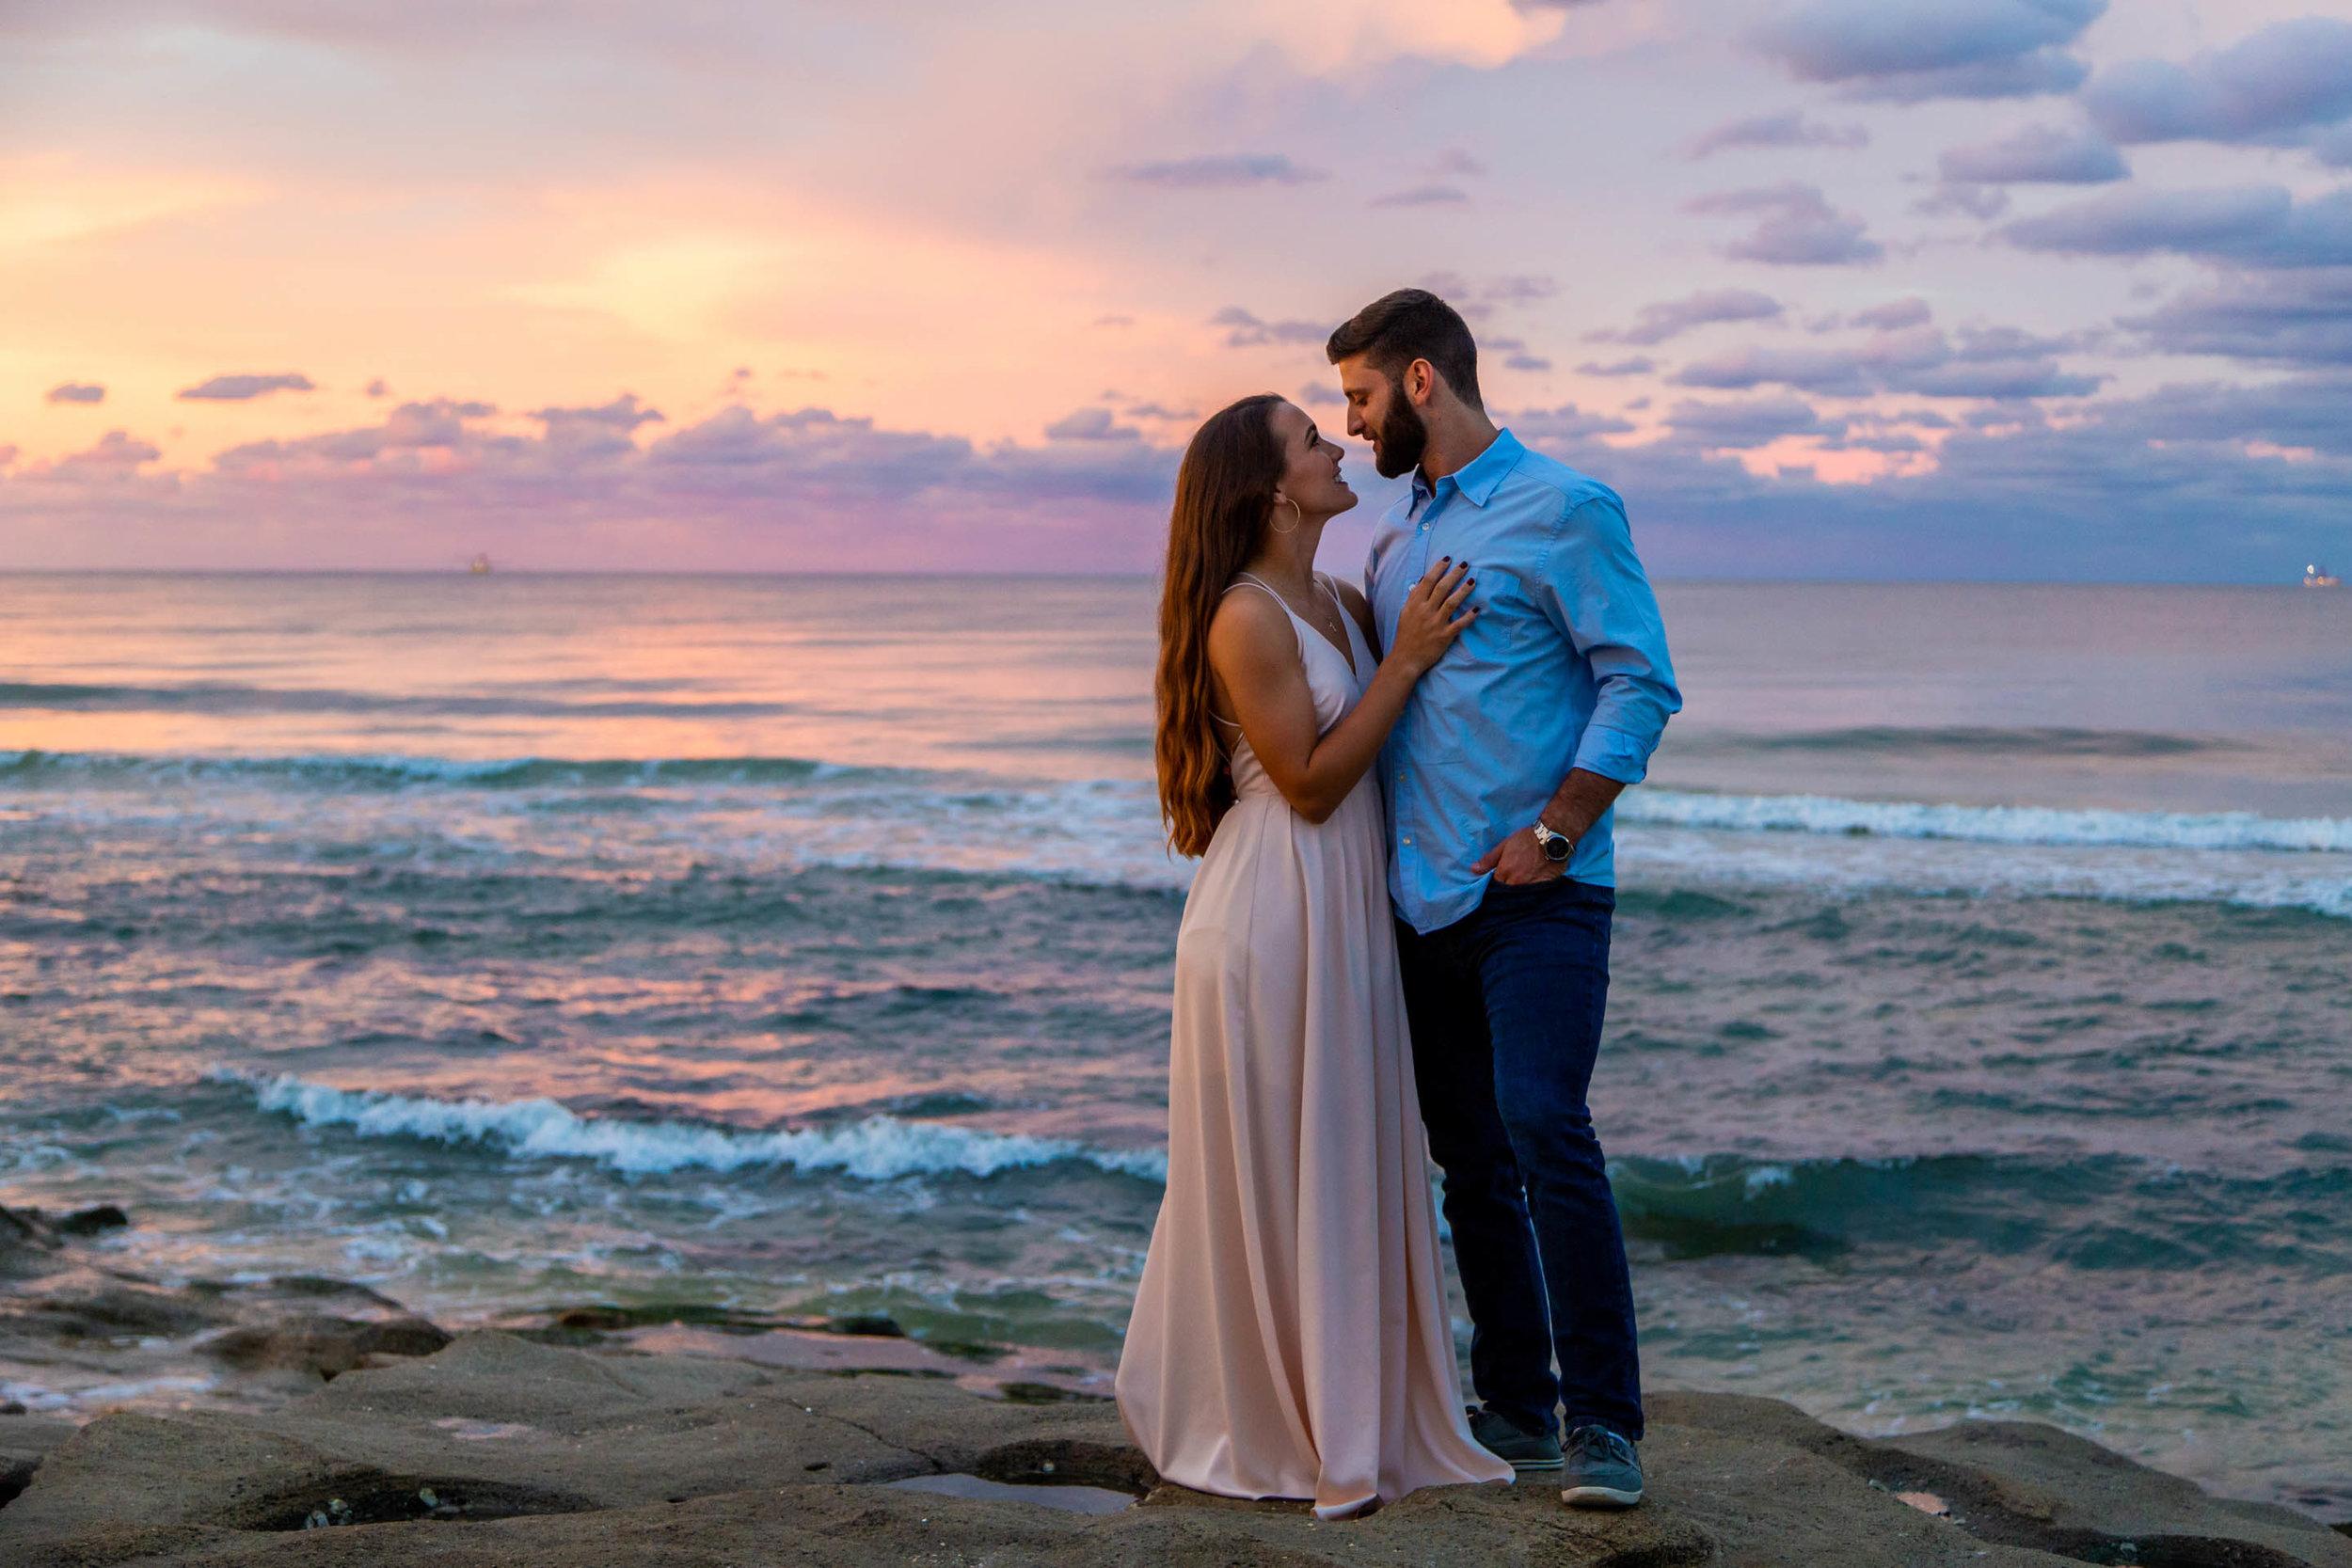 adam-szarmack-jacksonville-wedding-photographer-palm-coast-washing-oaks-garden-state-park-engagement-59.jpg